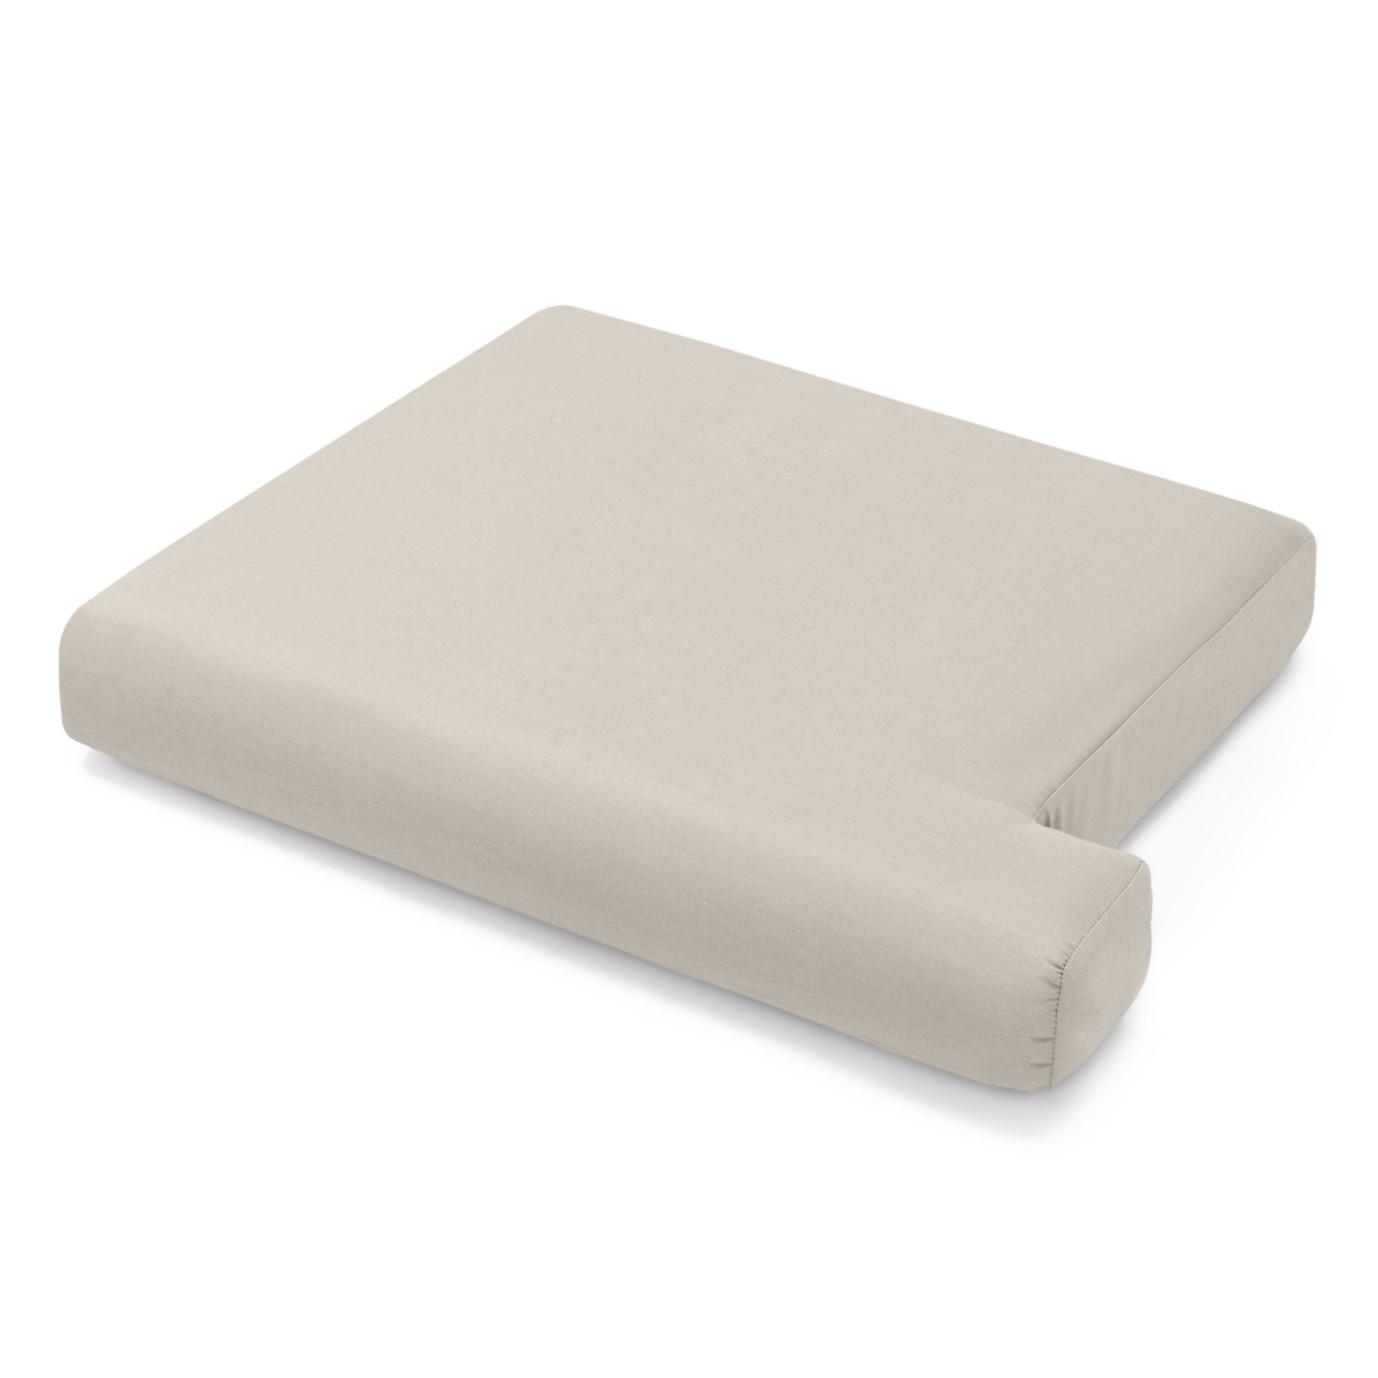 Portofino Comfort 71in Loveseat Left Base Cushion - Taupe Mist